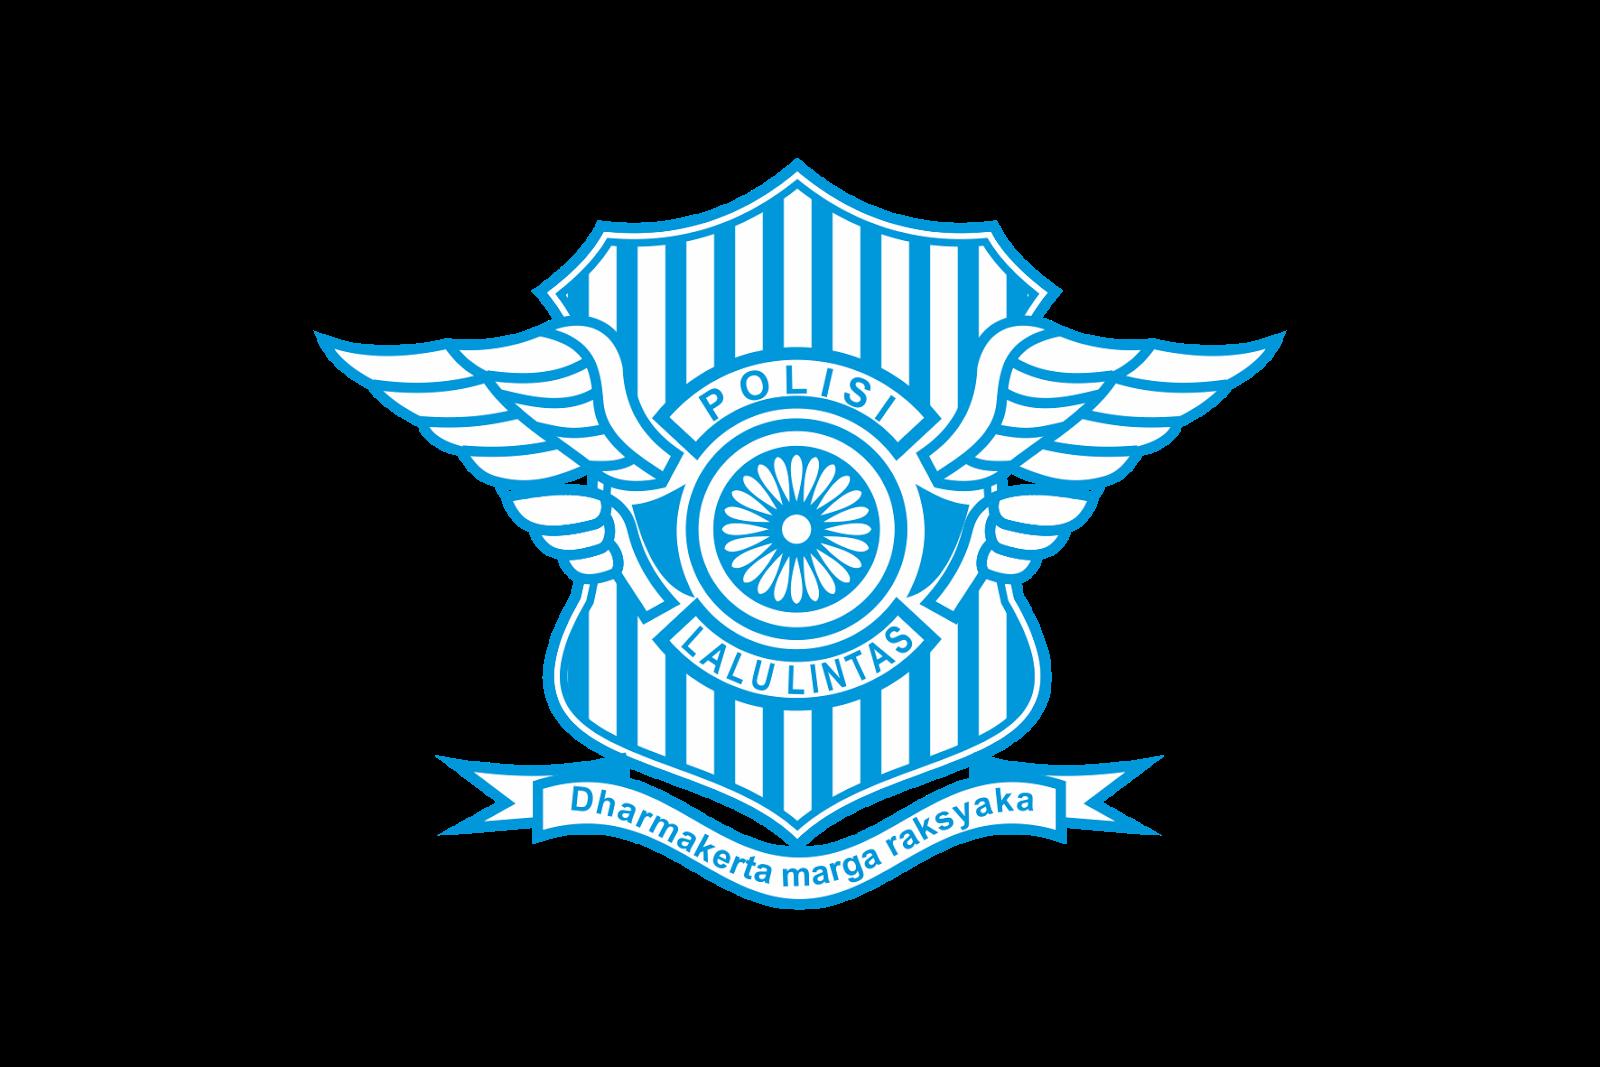 Polisi Lalu Lintas Logo.